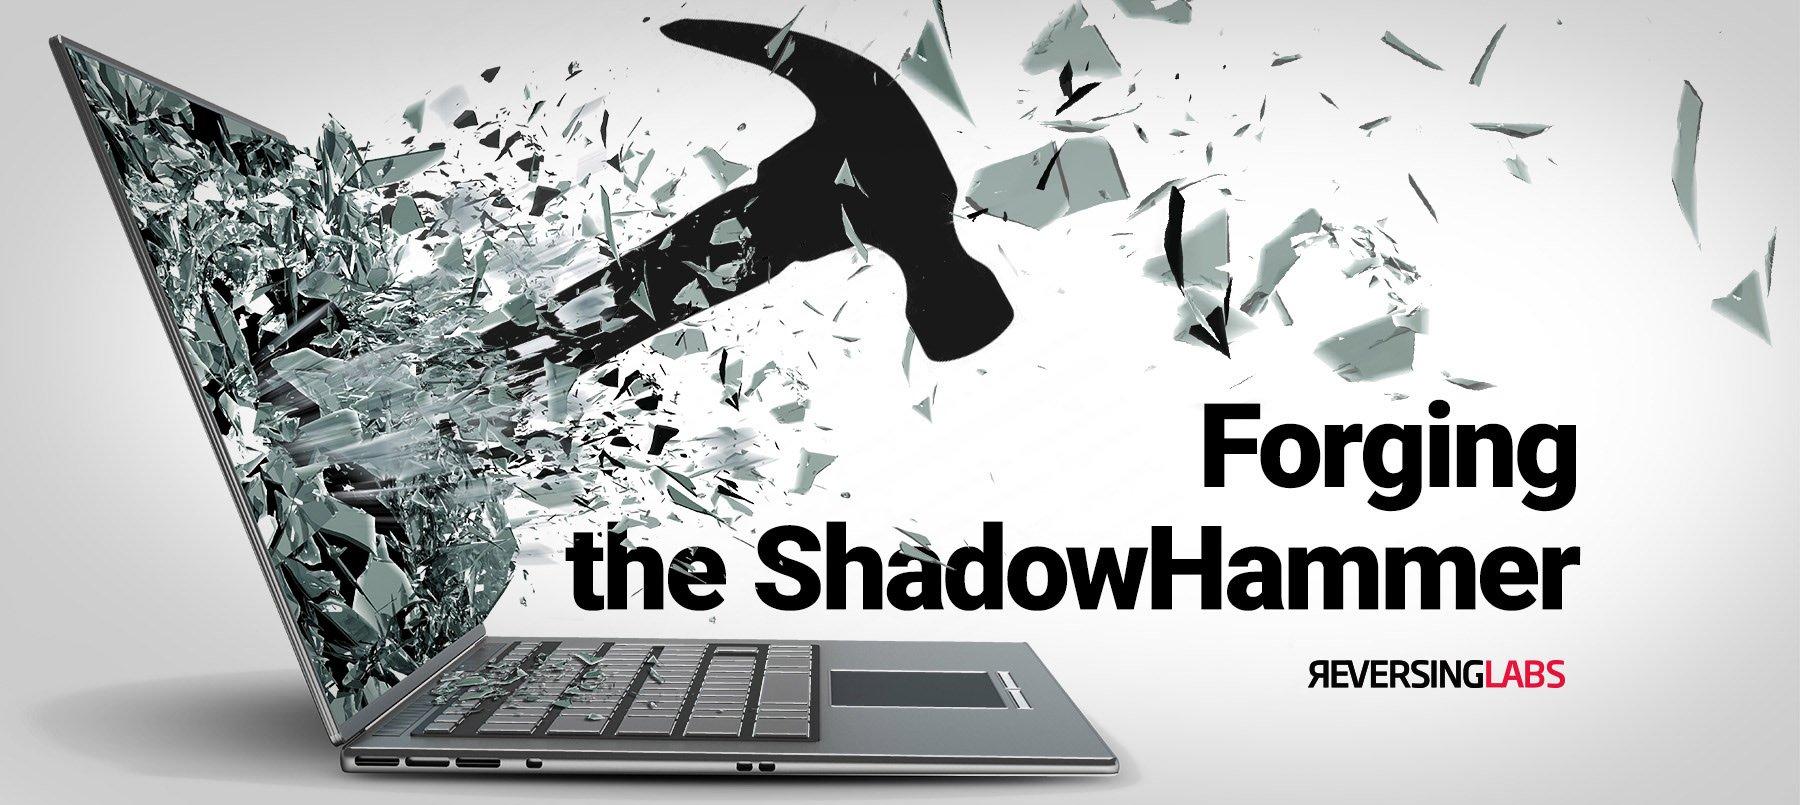 Forging the ShadowHammer